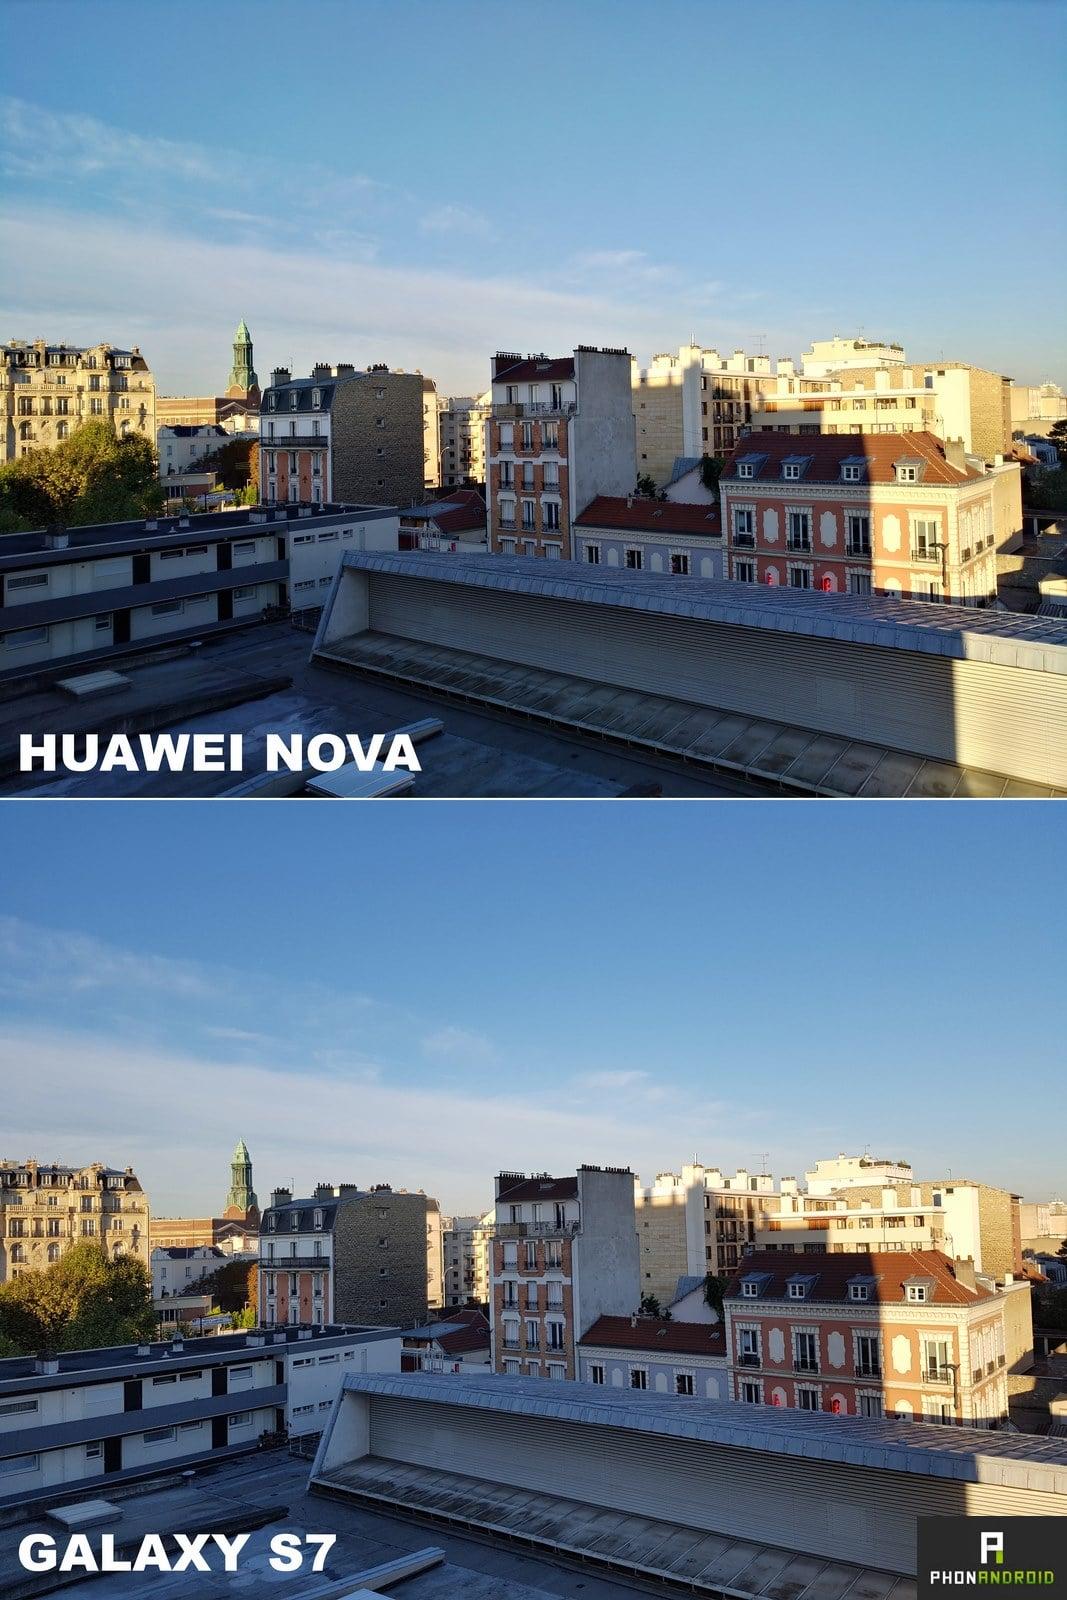 huawei nova vs galaxy s7 photo